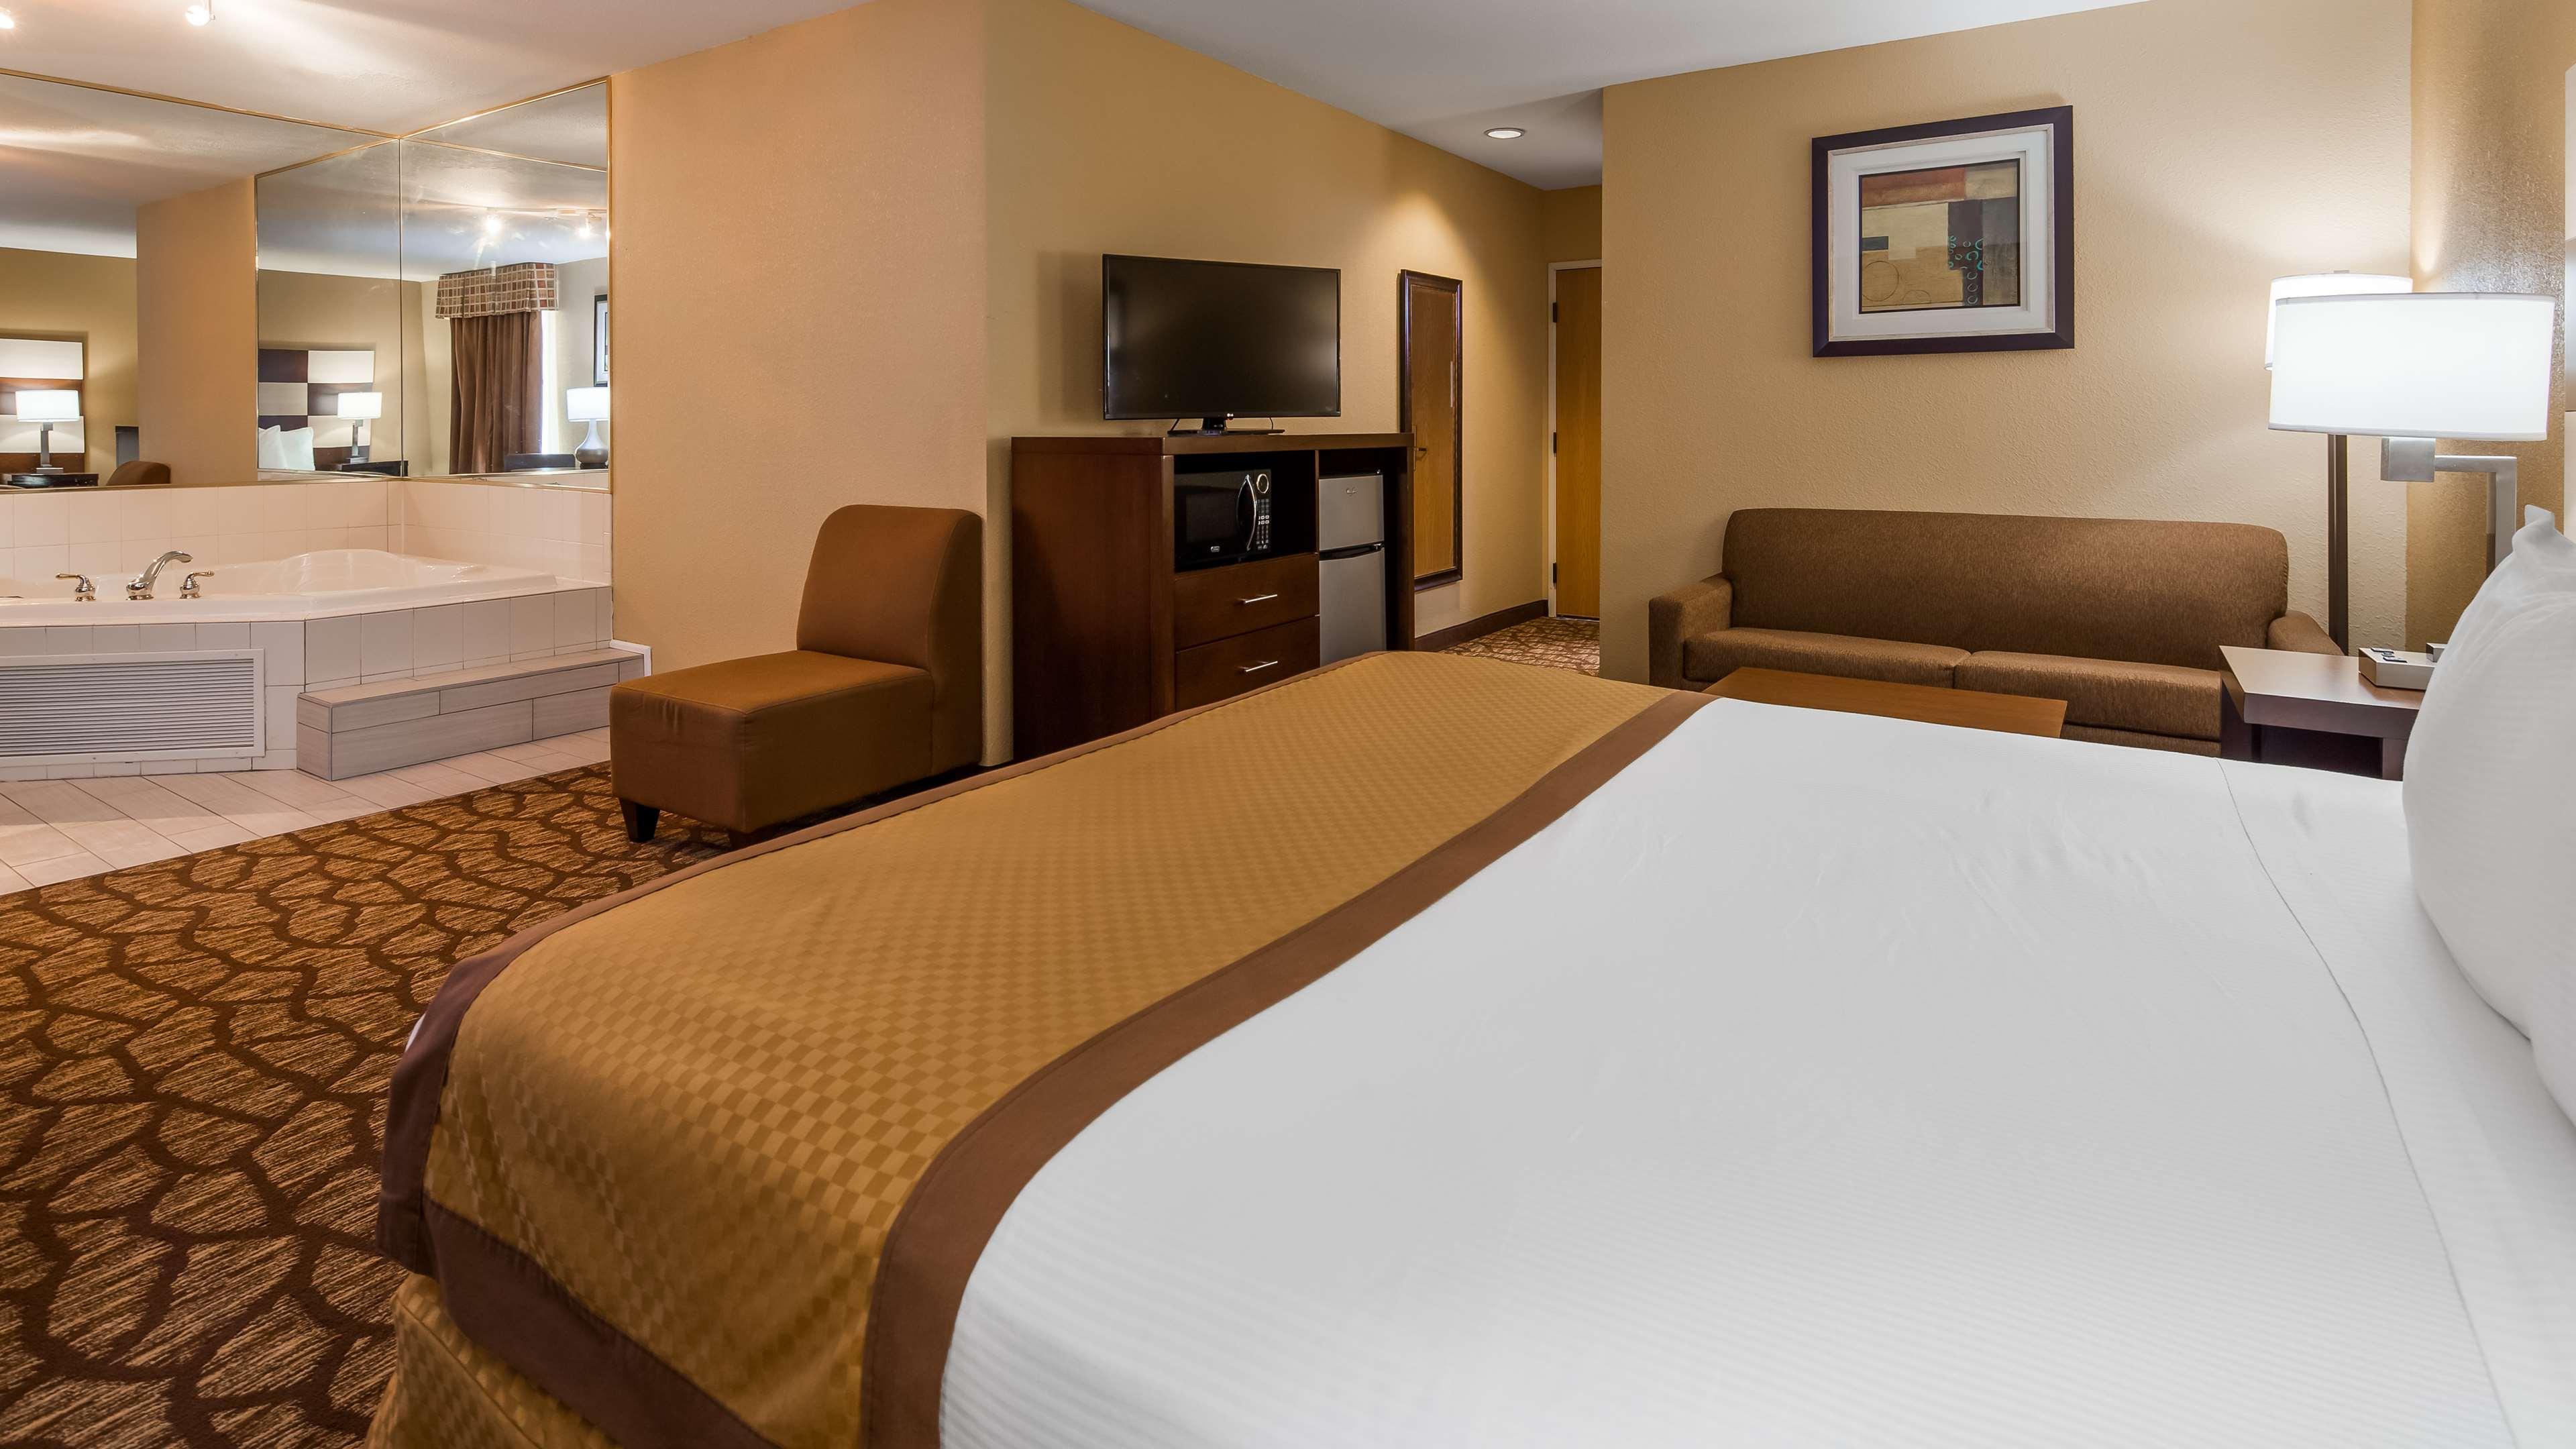 Best Western Joliet Inn & Suites image 13